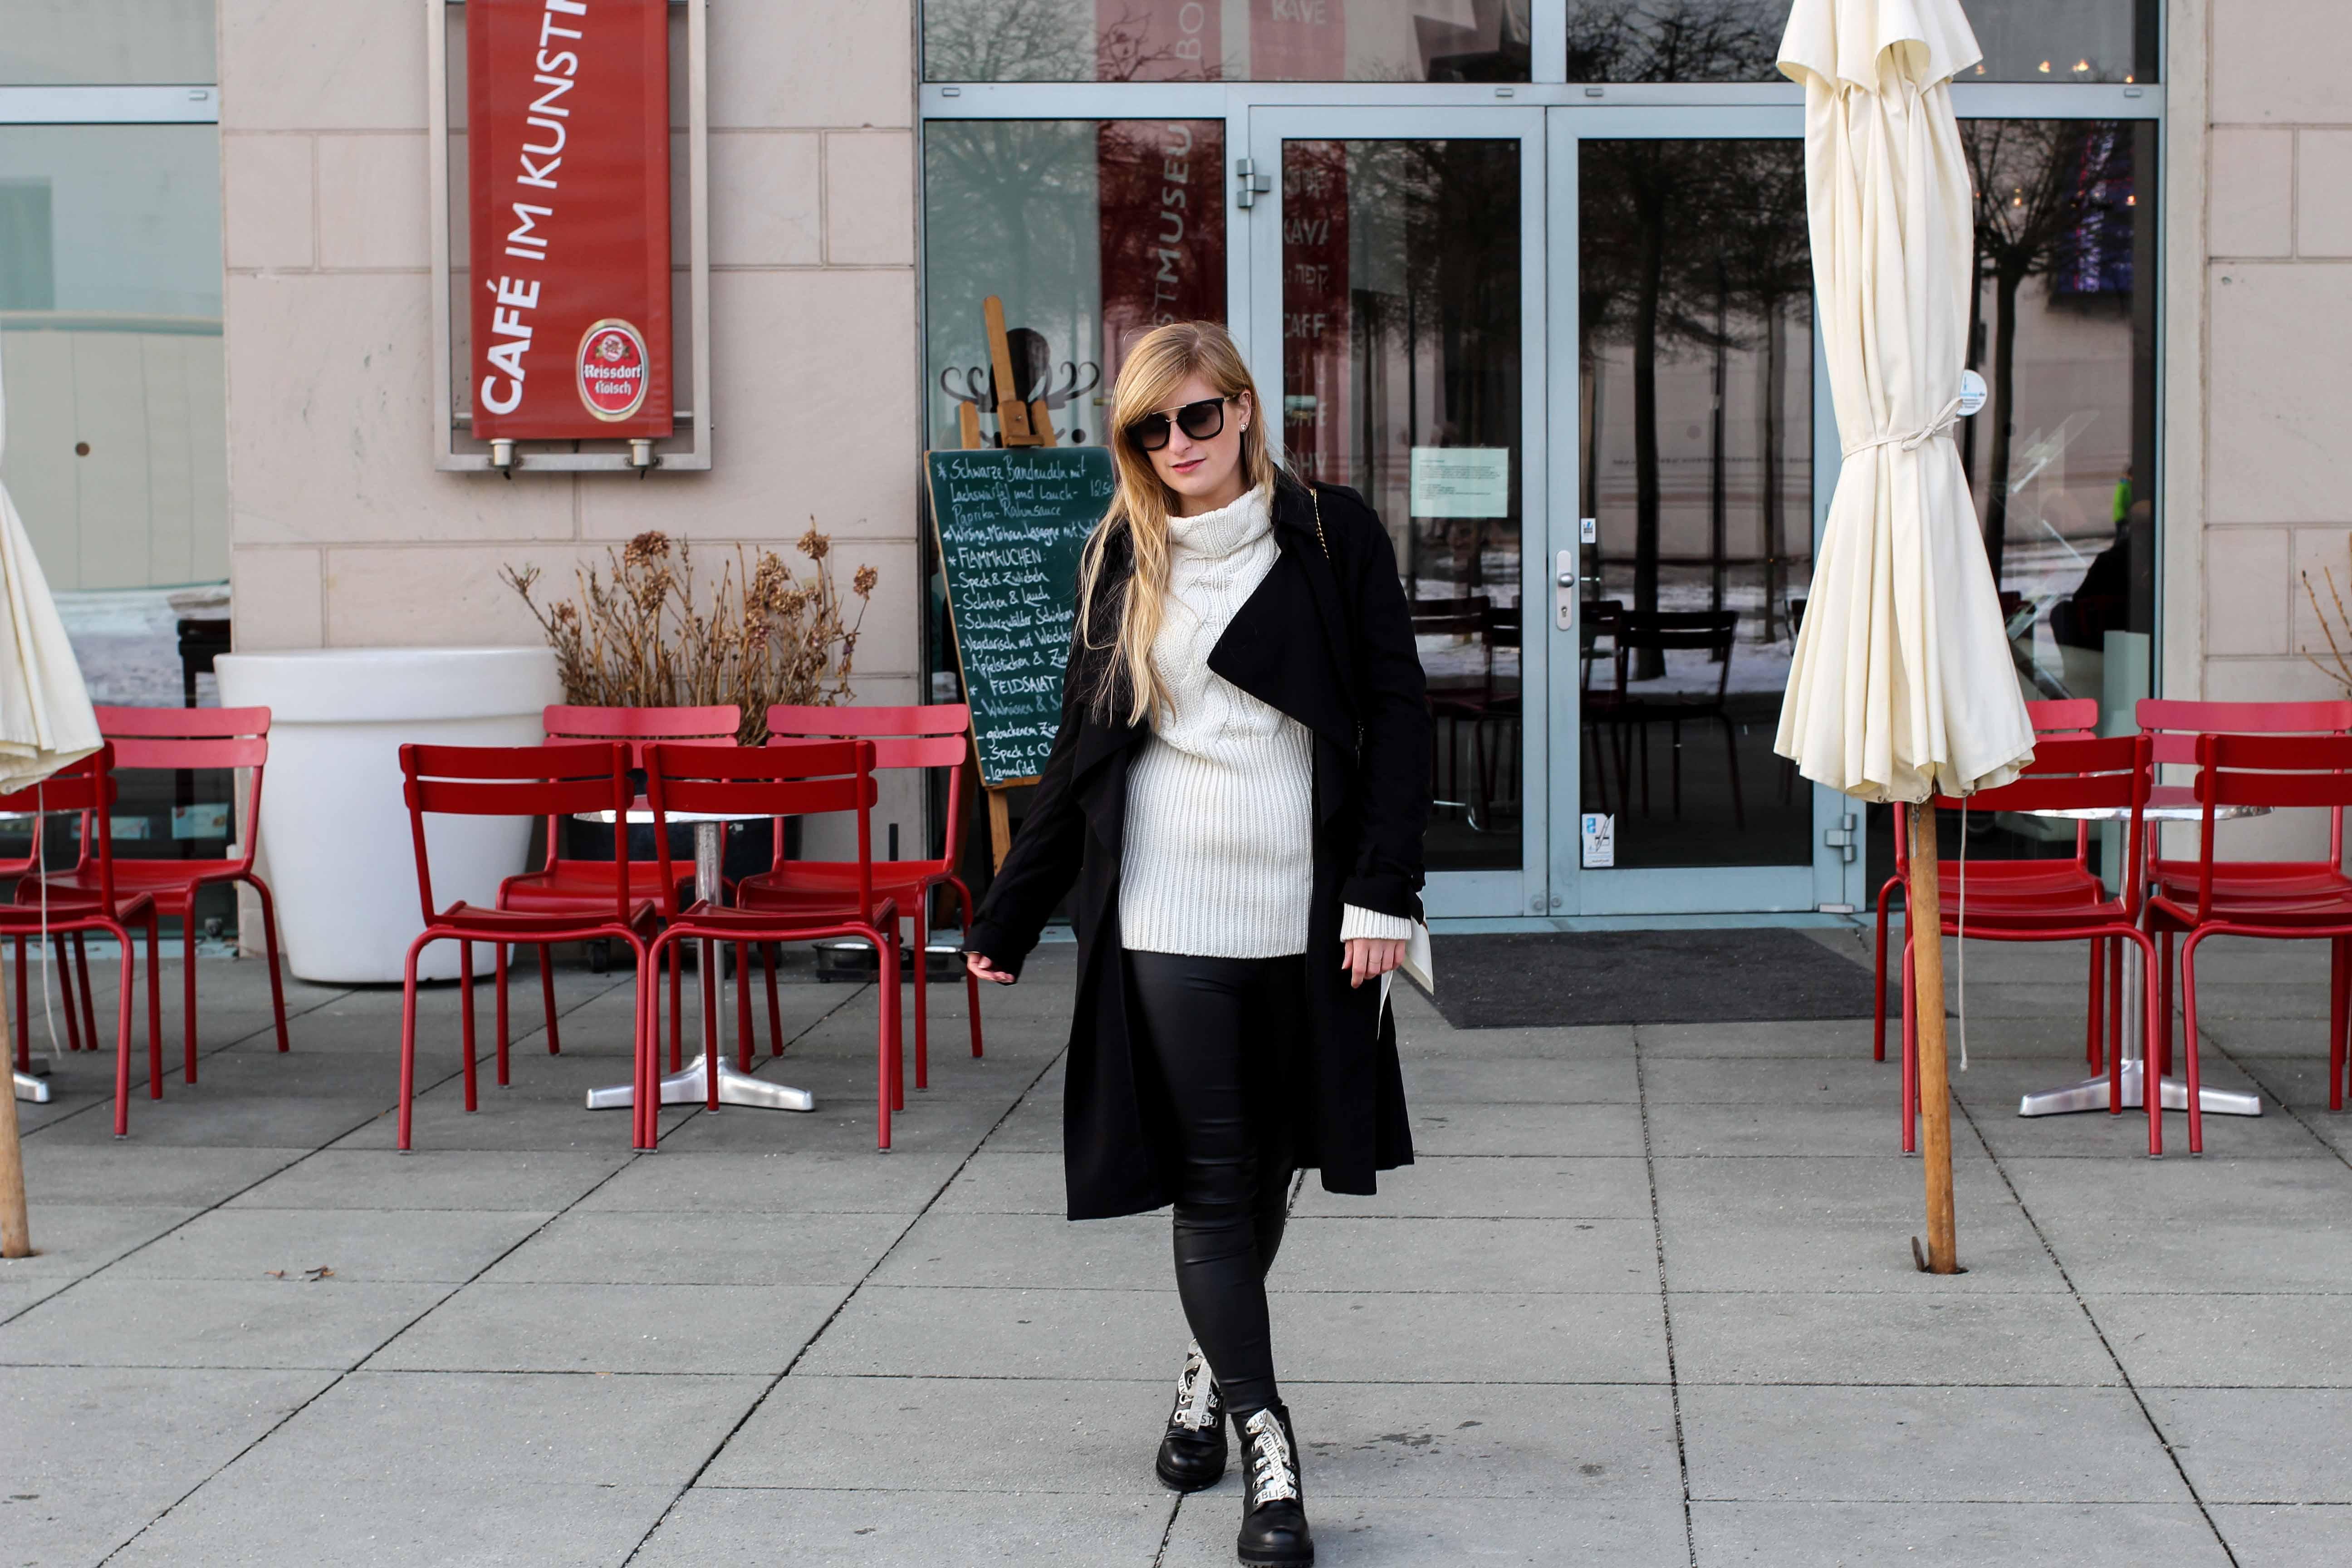 Schnürboots Zara Schnürsenkel Gucci Dionysus Garden Print Frühlingslook kältere Tage schwarze Lederleggins Modeblogger Bonn 6